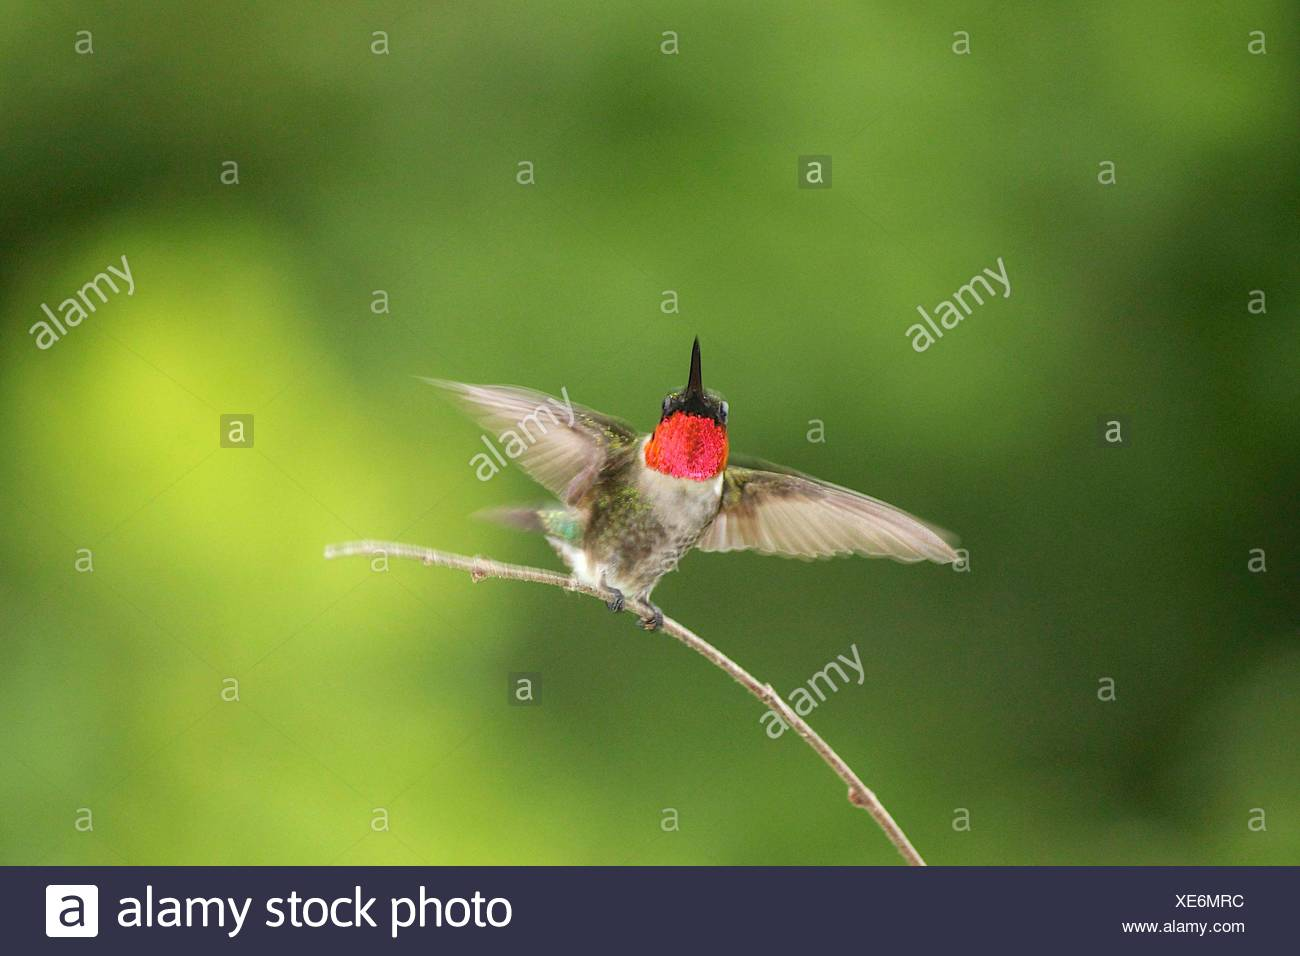 Humming bird perching on twig - Stock Image